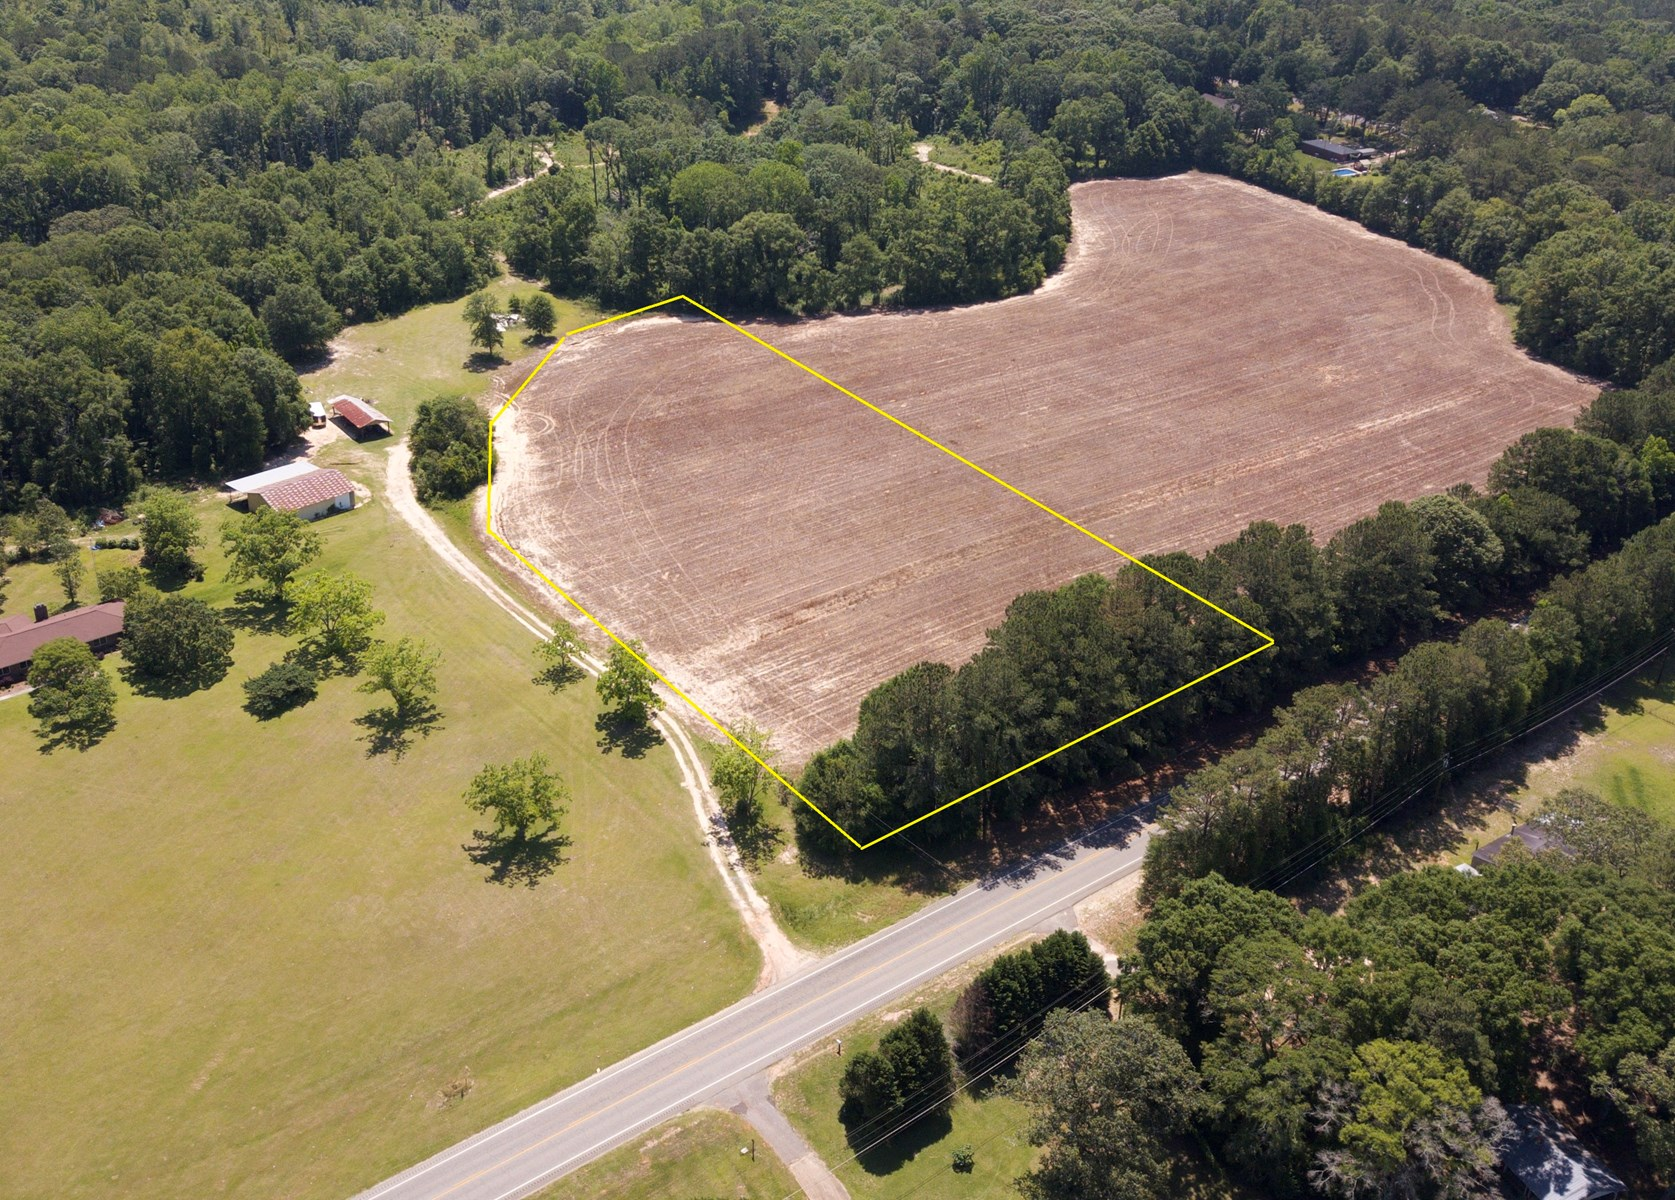 3.5 Acres for sale New Brockton, AL near Enterprise, AL